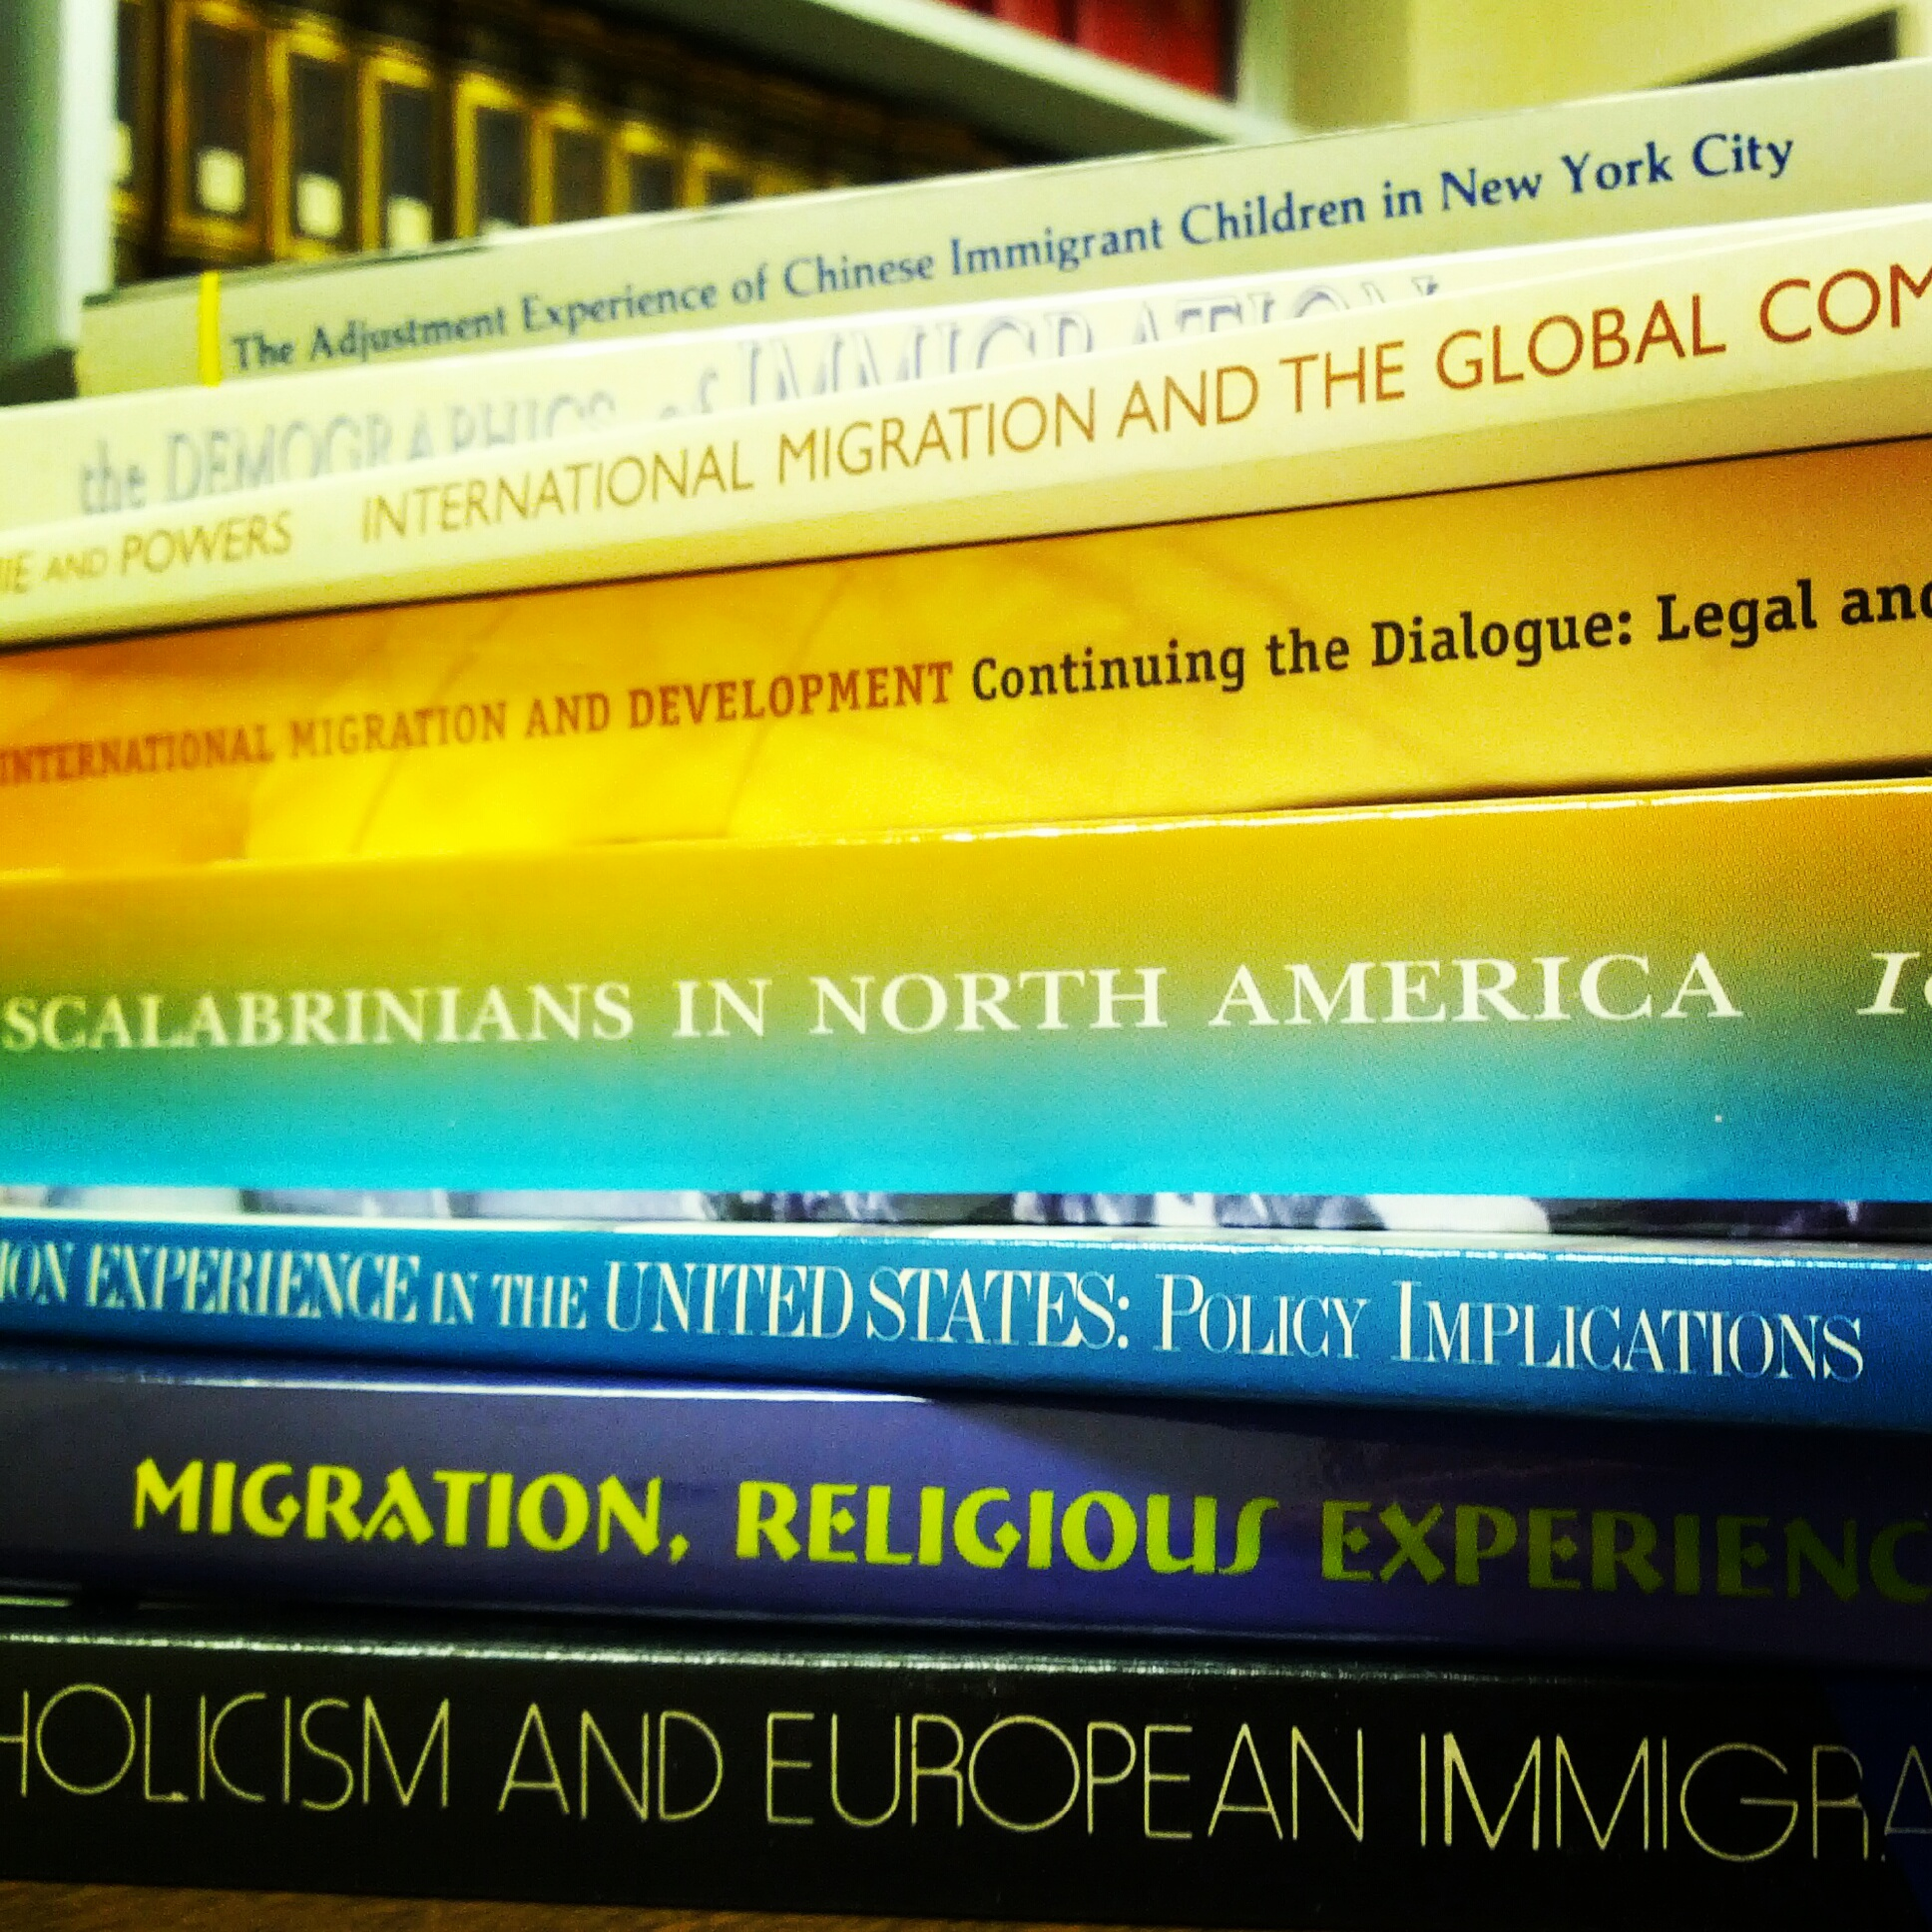 CMS Publications Now Free Online - The Center for Migration Studies